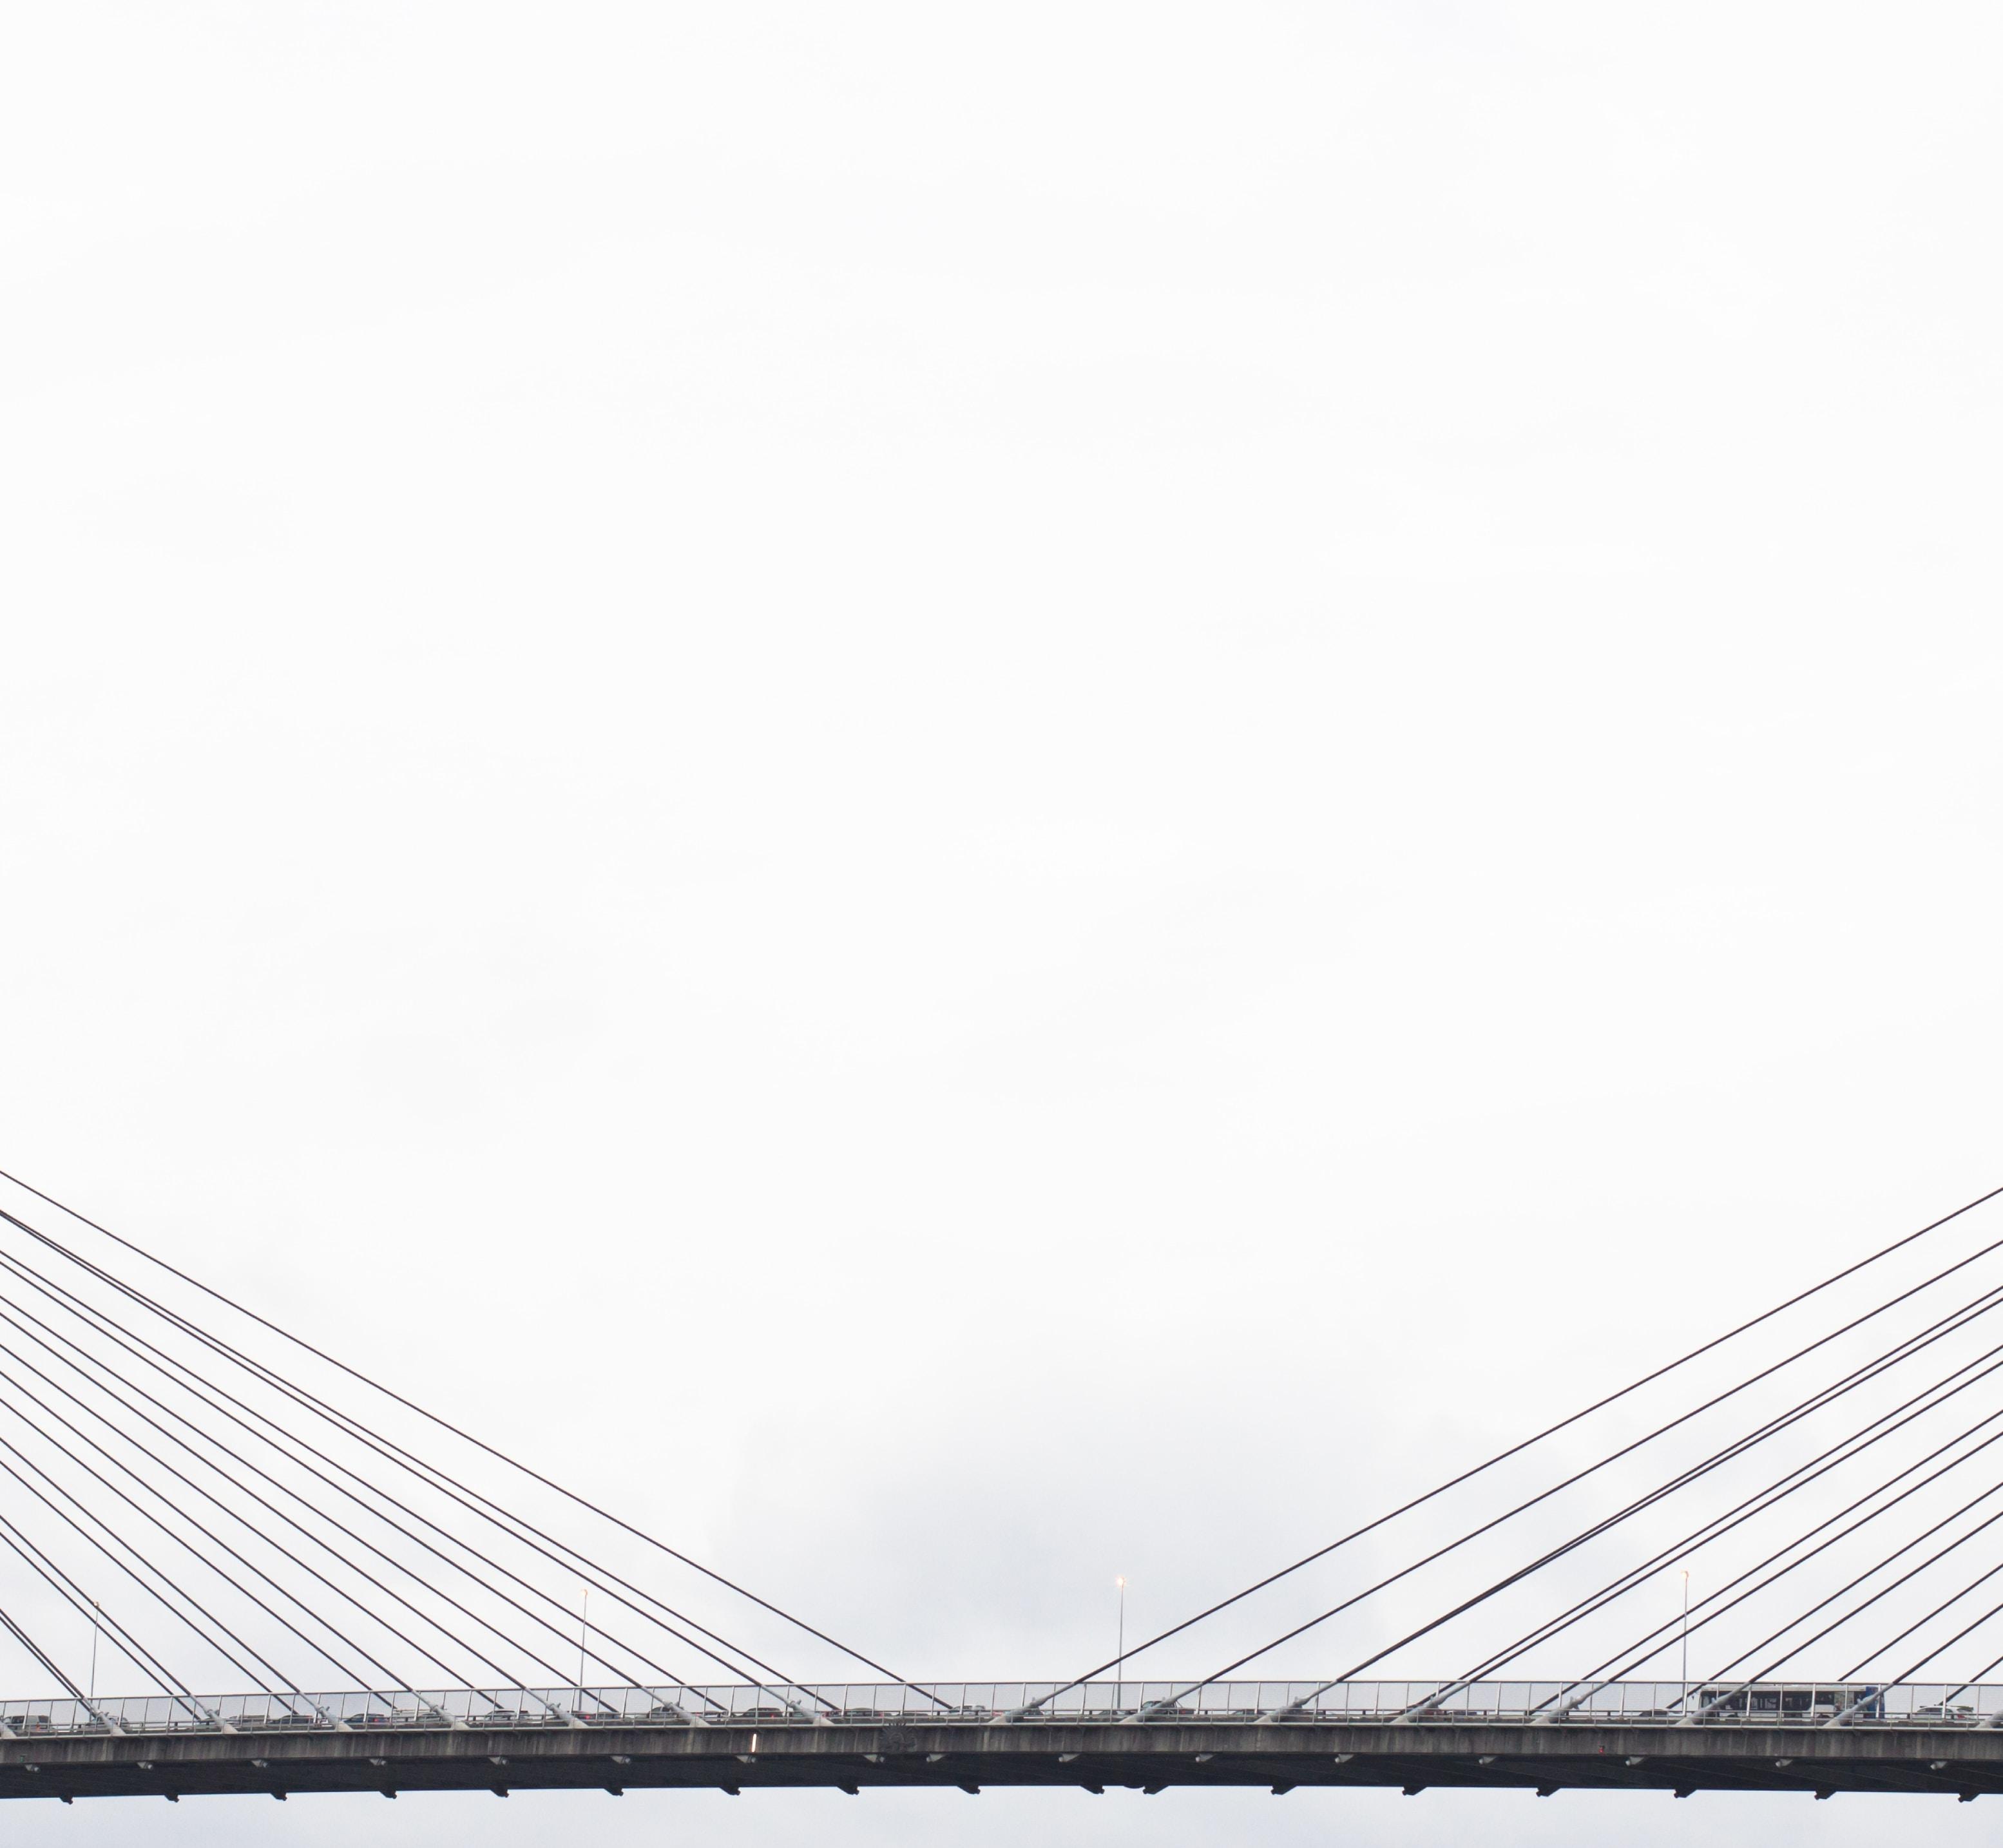 vehicles on grey suspension bridge under cloudy sky during daytime